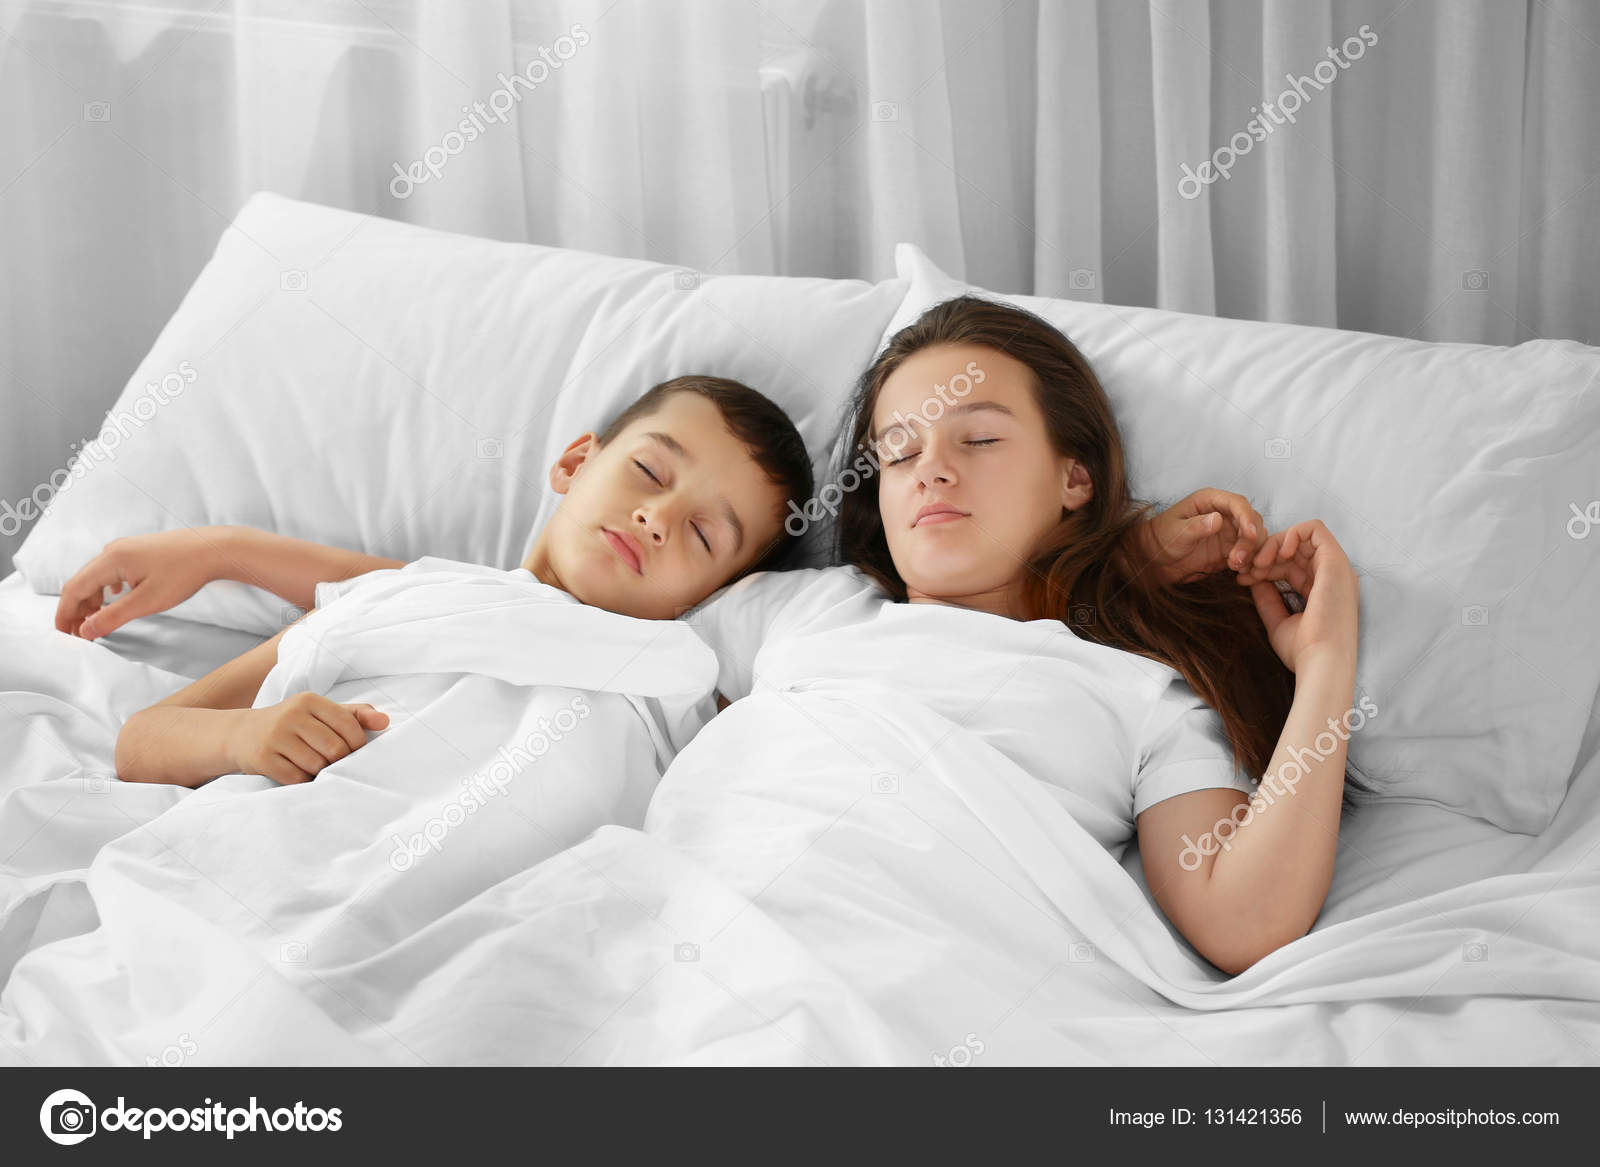 с сестрой в постели фото